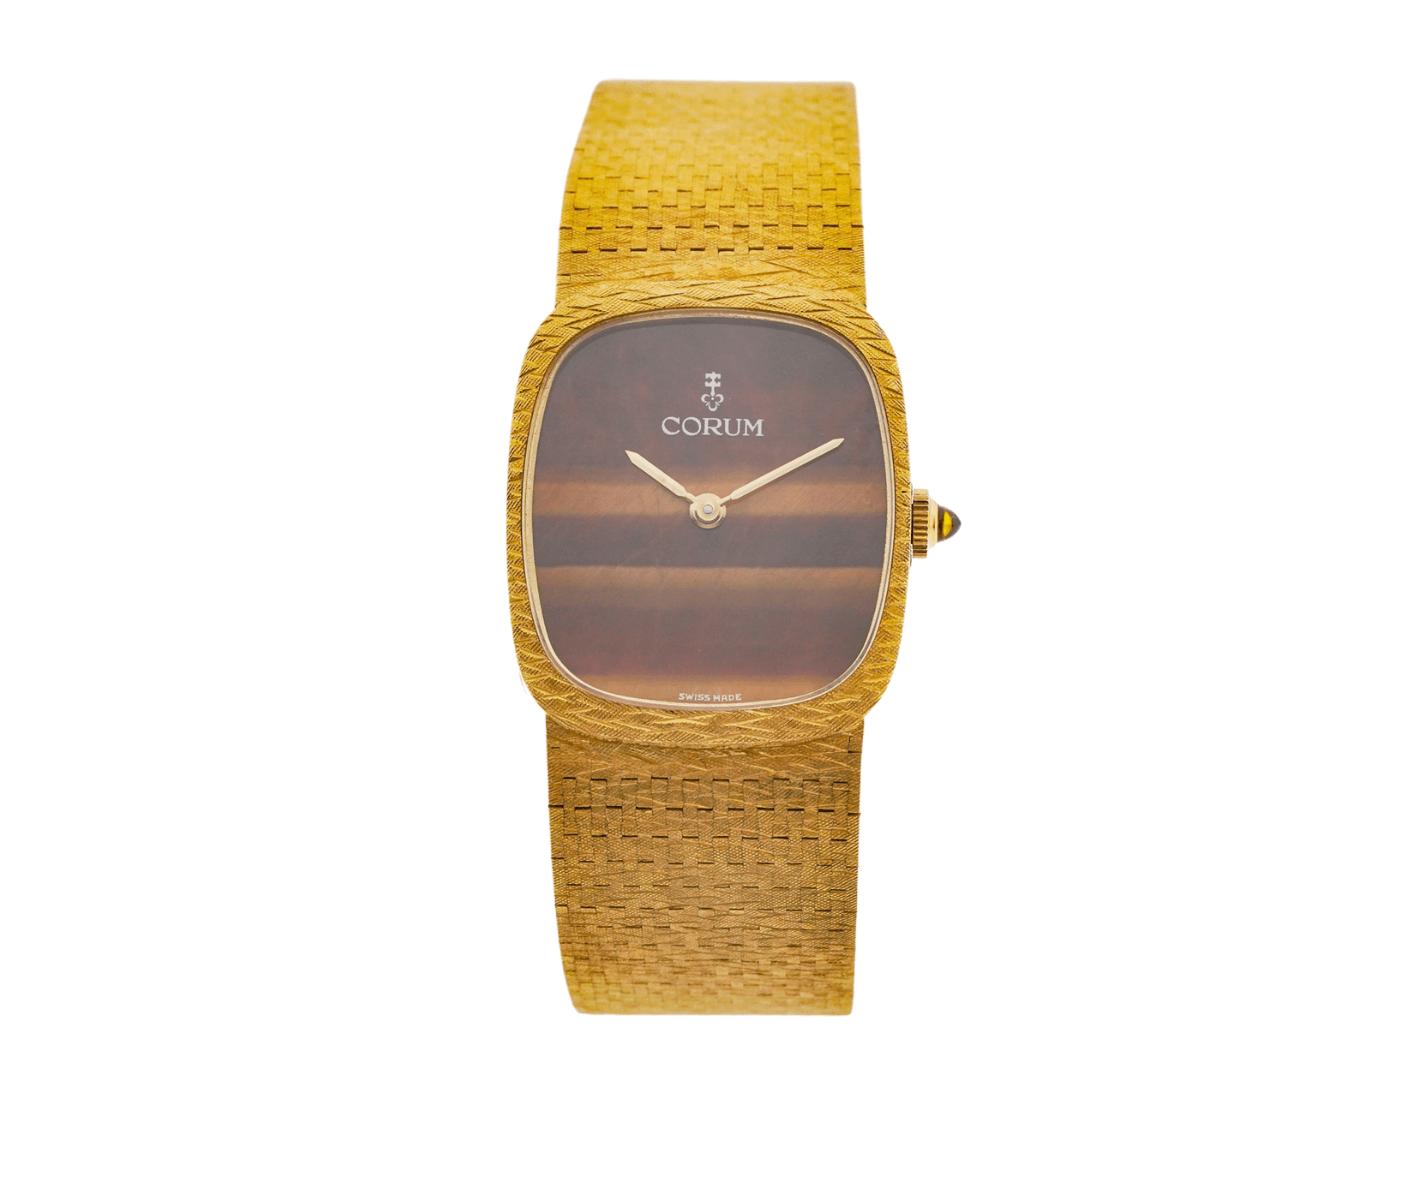 Rare Vintage Corum 180811 24.5mm 18kt Yellow Gold Swiss Tiger's Eye Dial Swiss Manual Wind Wrist Watch